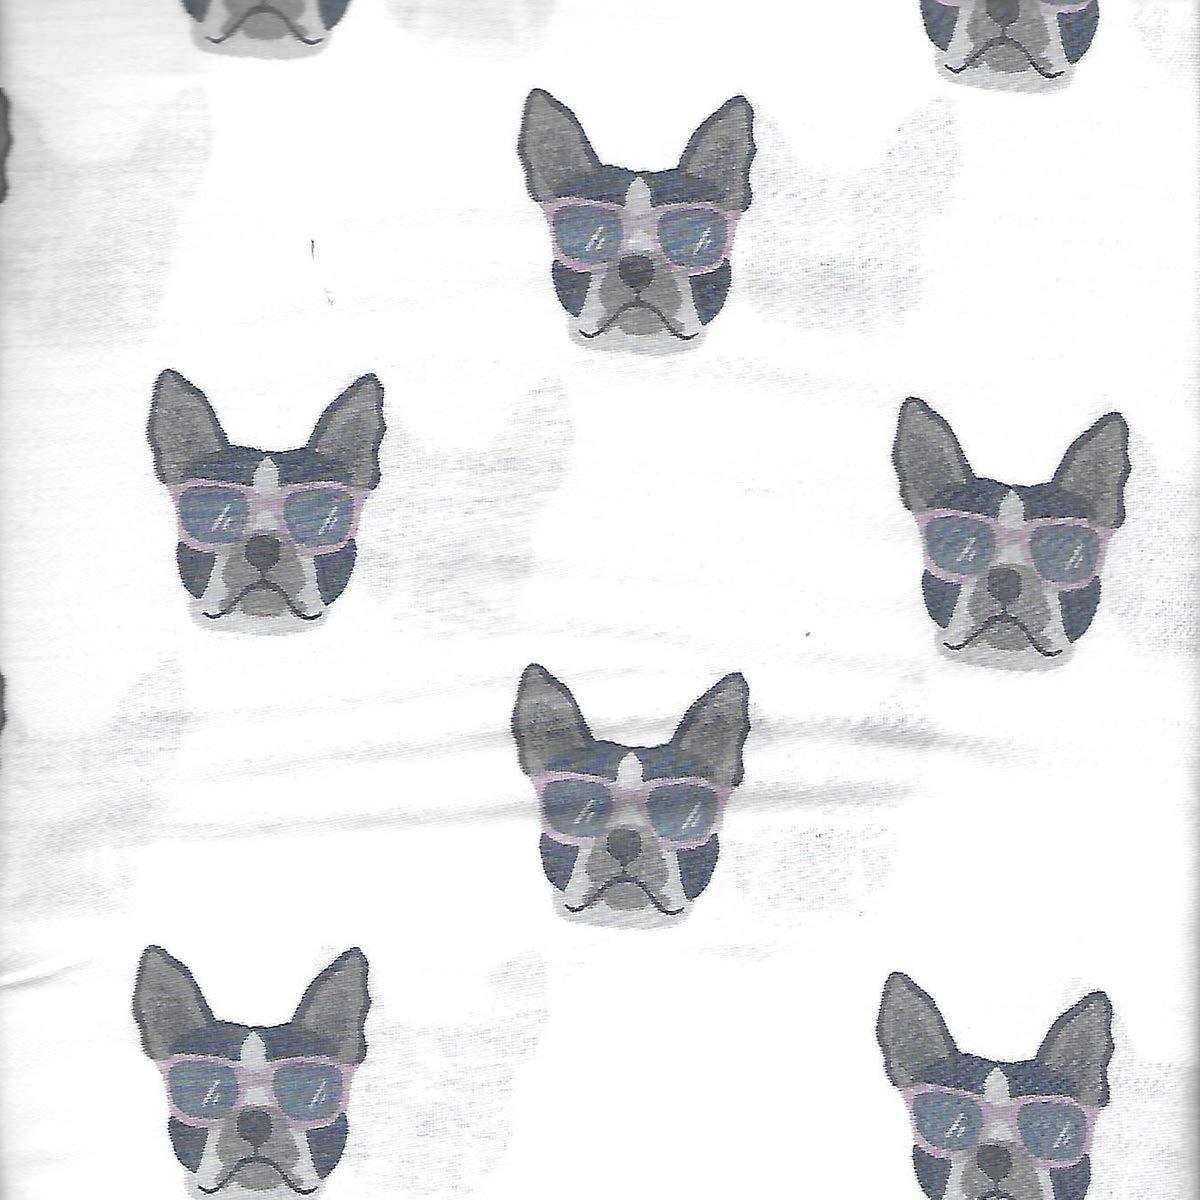 Queen London Kaye Cute French Bulldog Faces Wearing Sunglasses 4 Piece Novelty Sheet Set